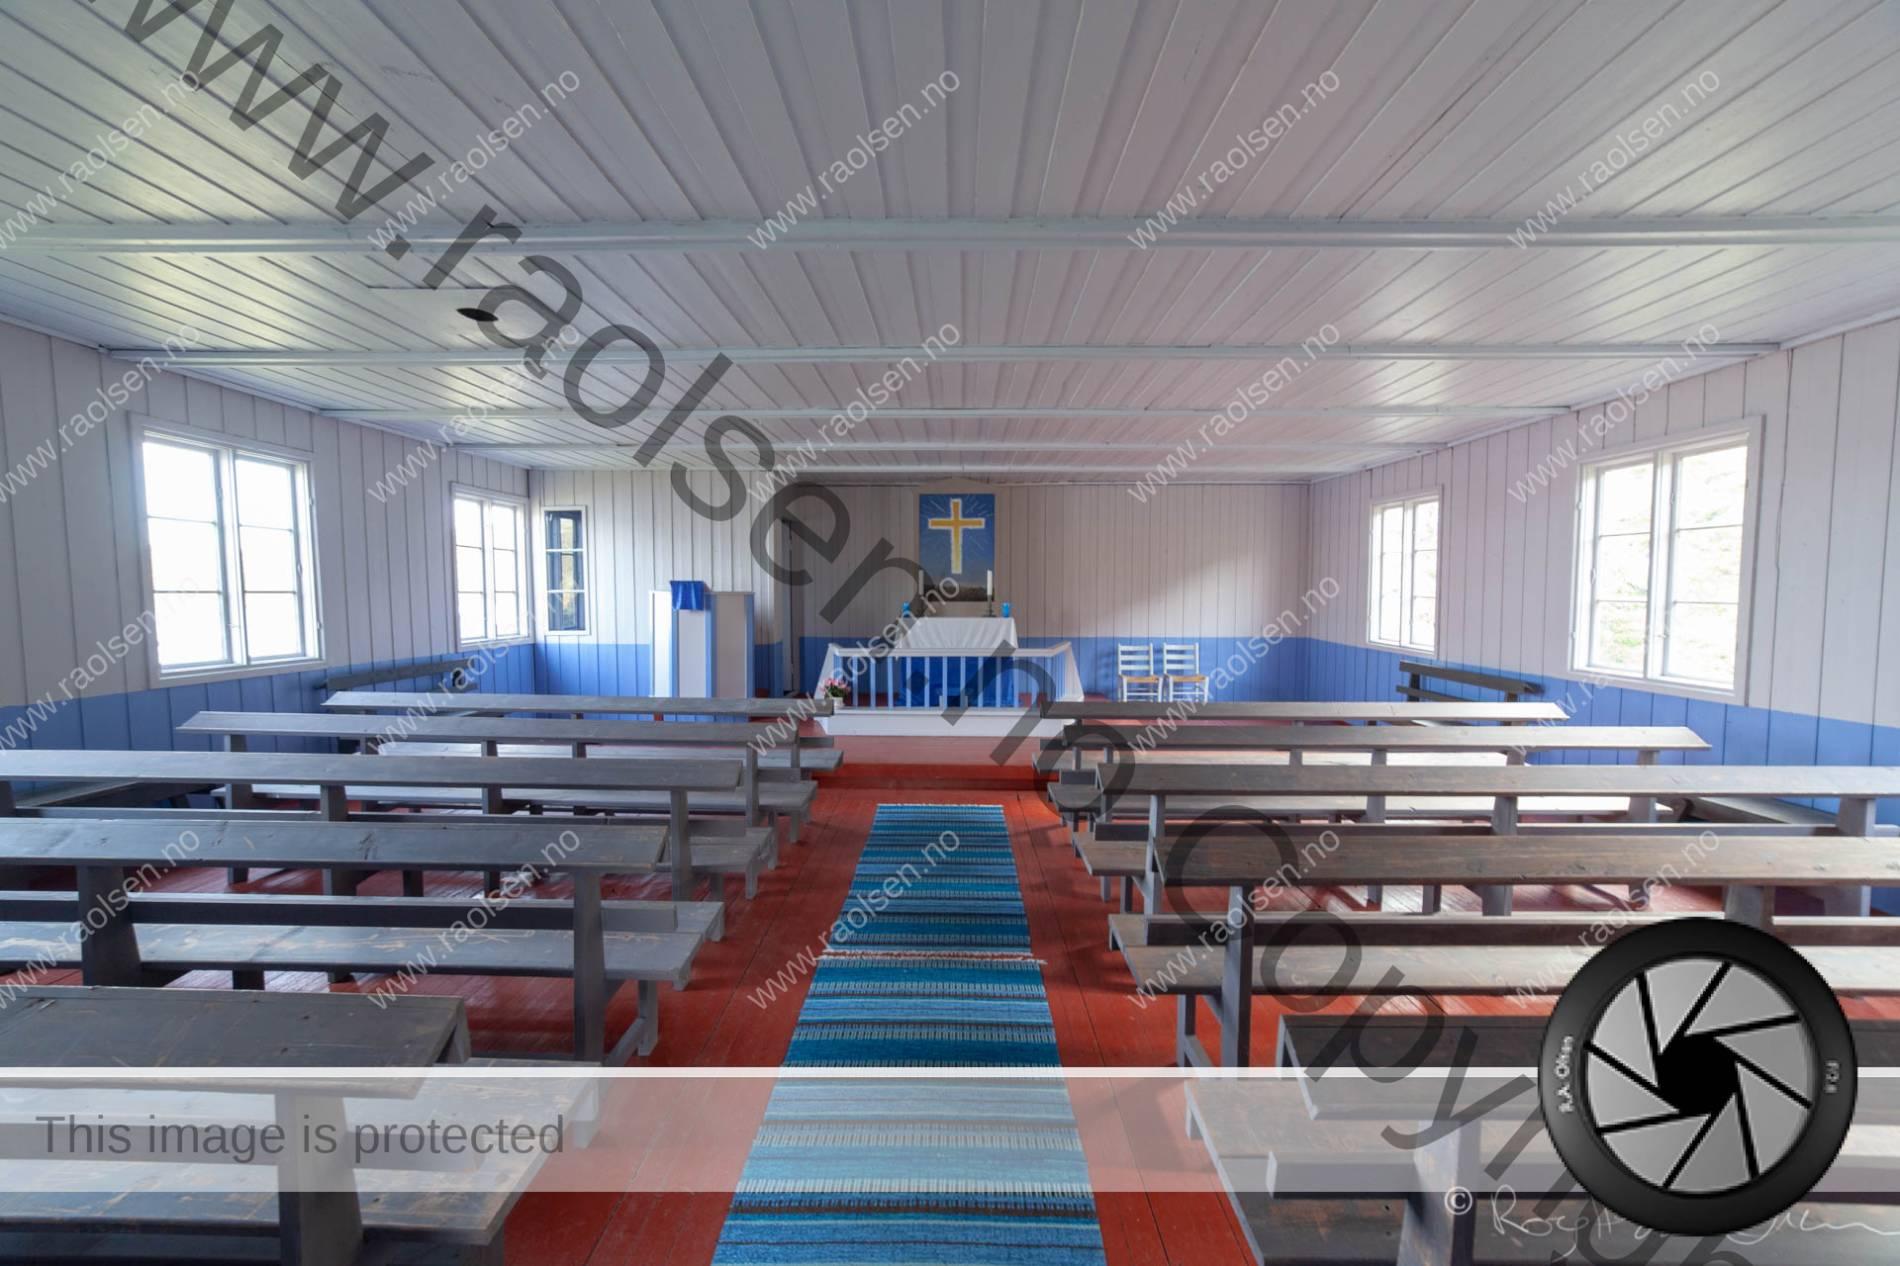 Kirkelokalet